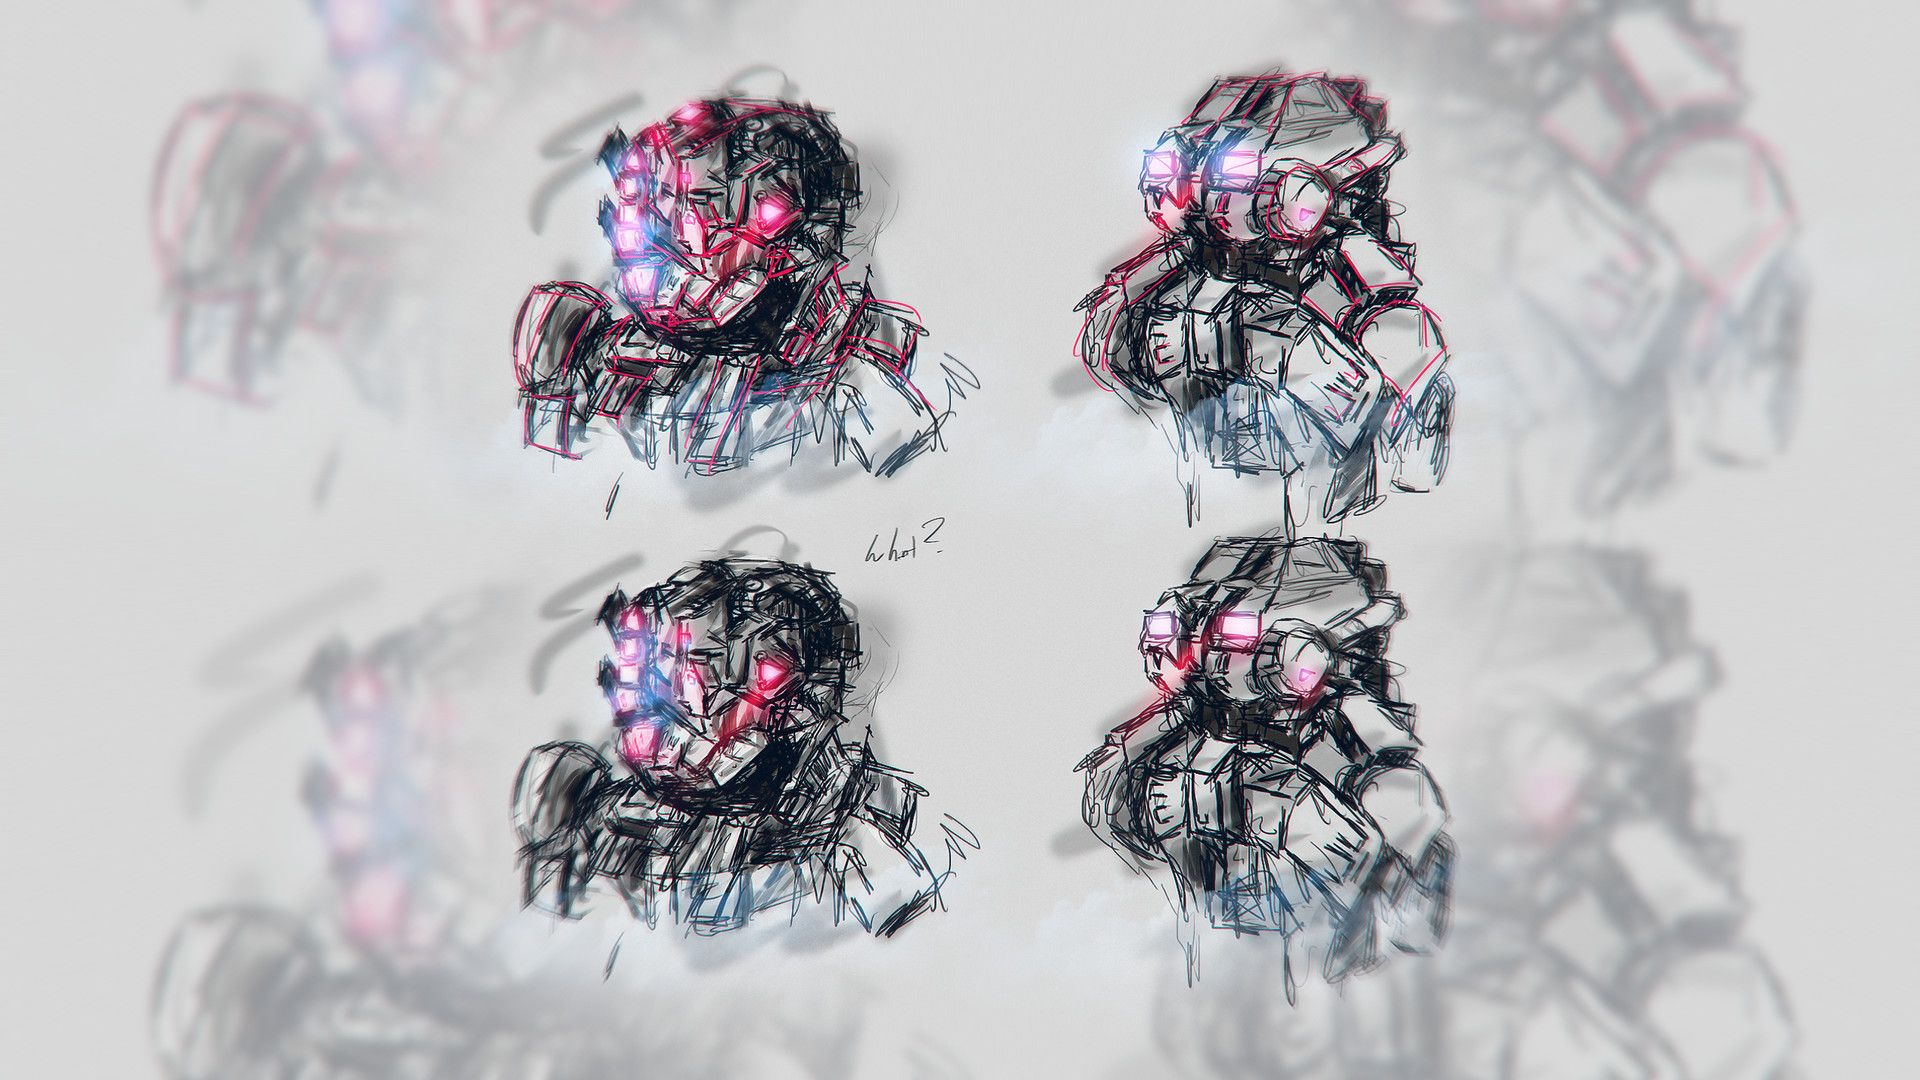 ArtStation - Sketches.., Jonathan Lucero